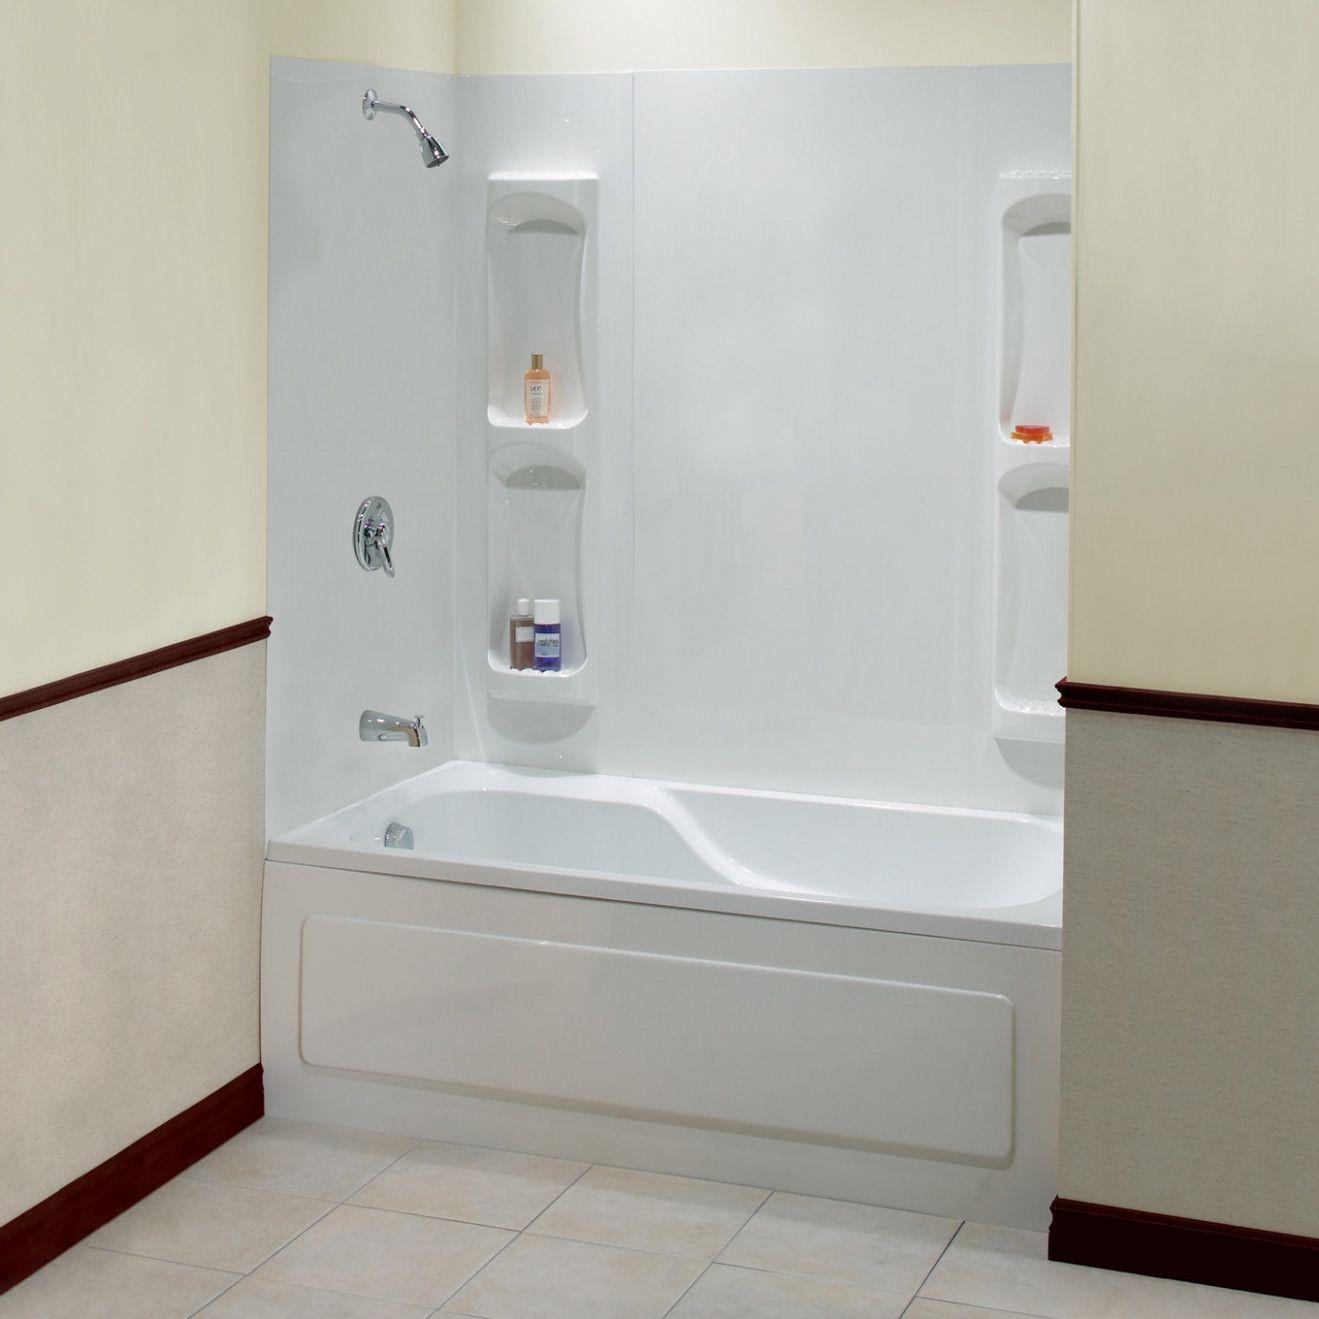 Fiberglass Tub Shower Combo | www.topsimages.com